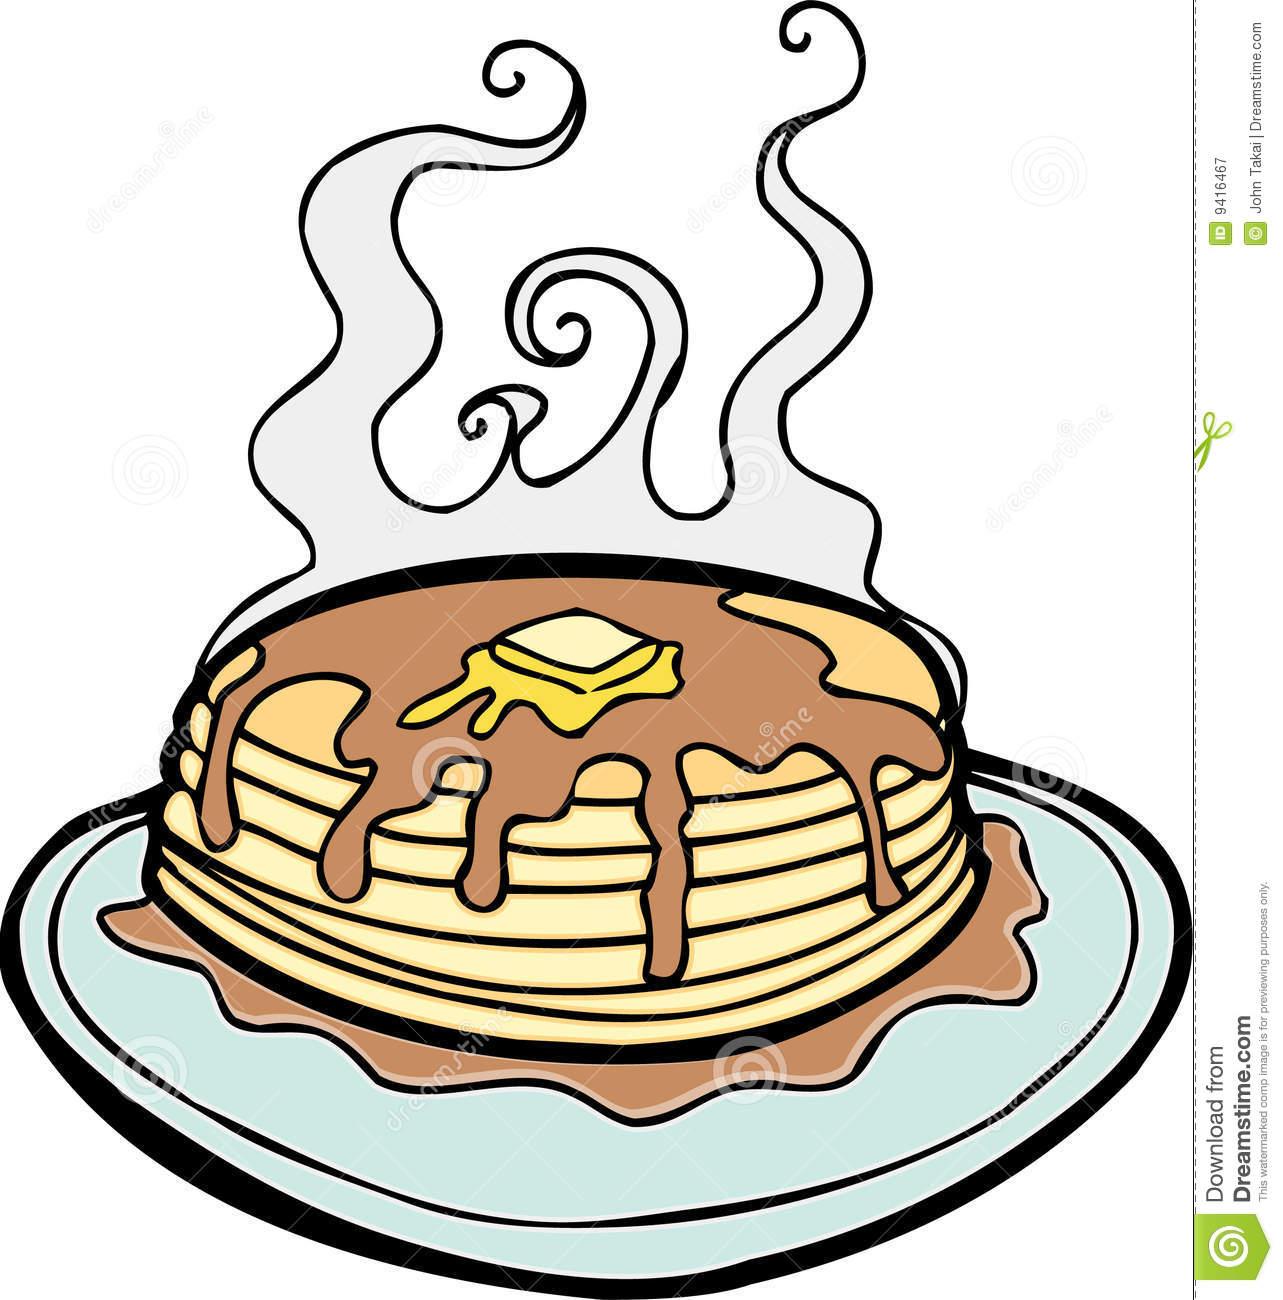 hight resolution of pancakes stock illustrations